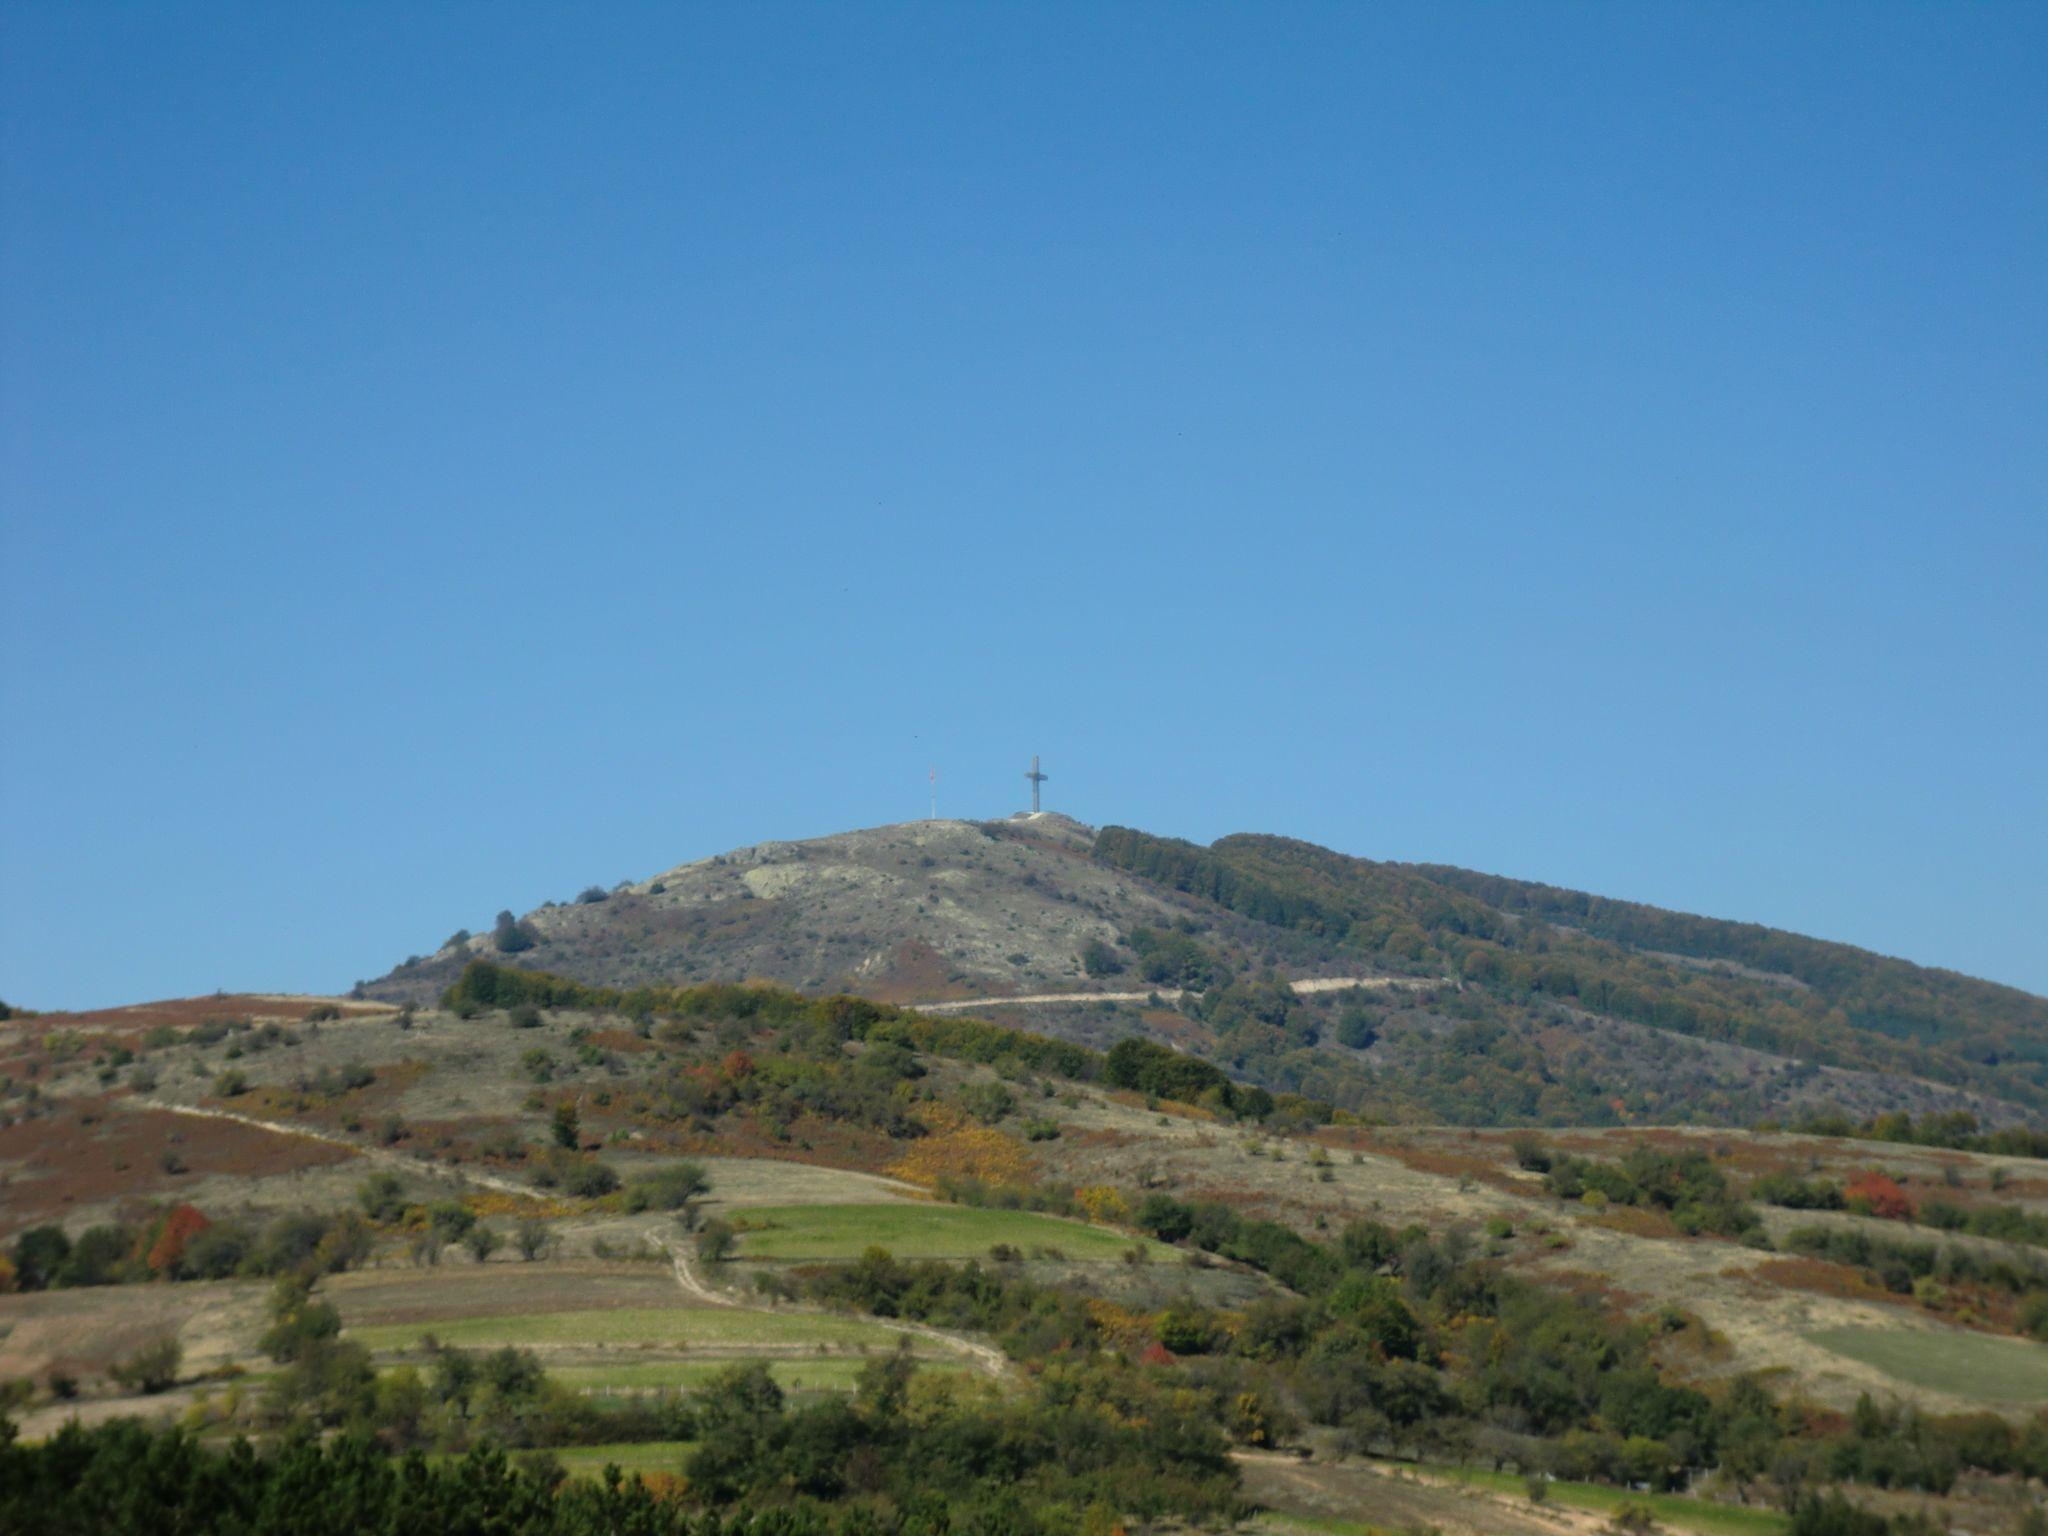 CIMG0143 - Macedonian landscapes